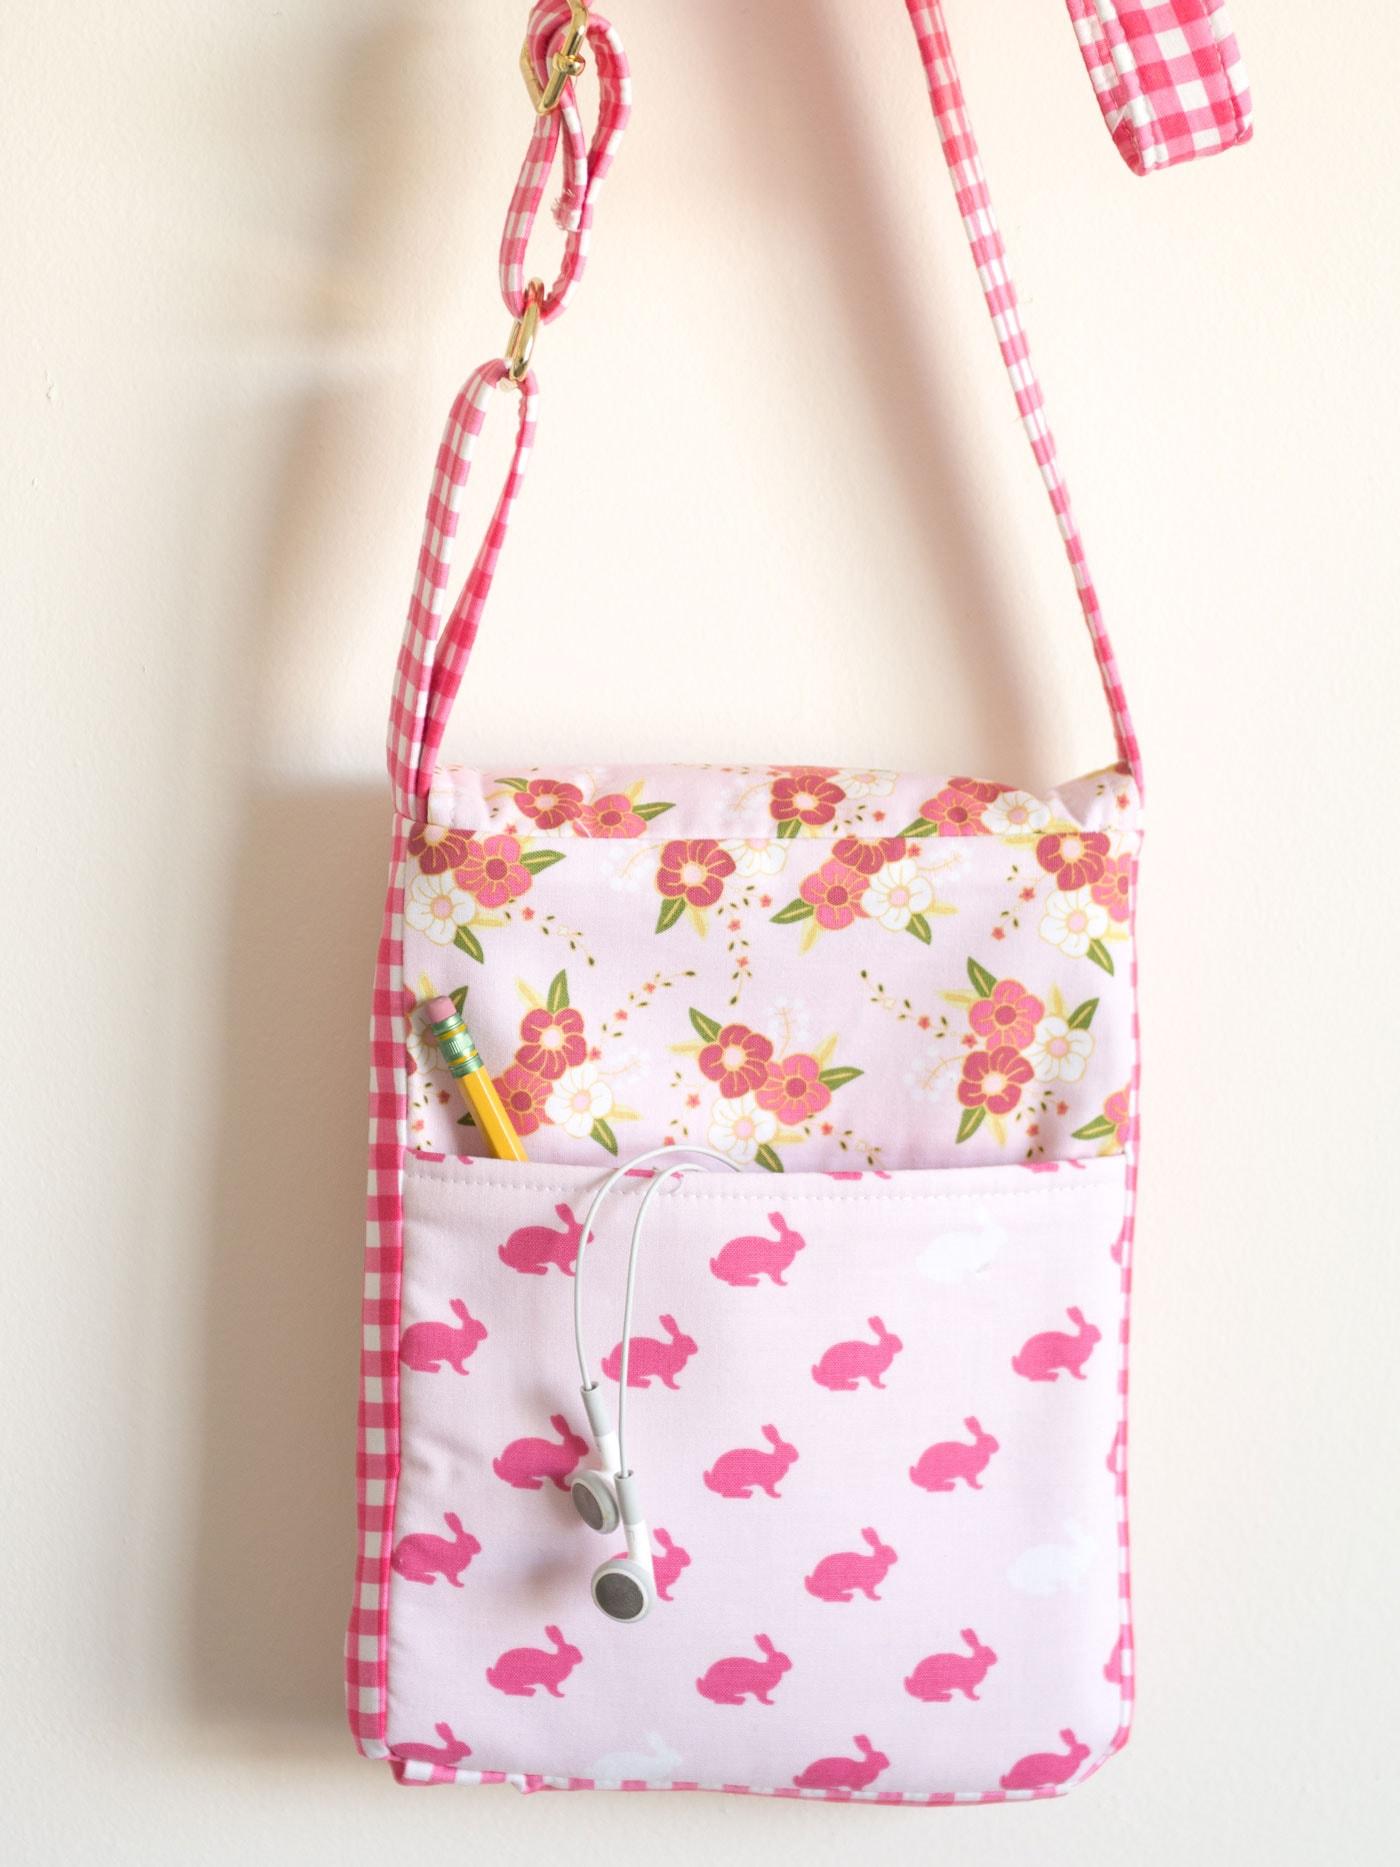 Cross Body Bag Sewing Pattern  The Polka Dot Chair